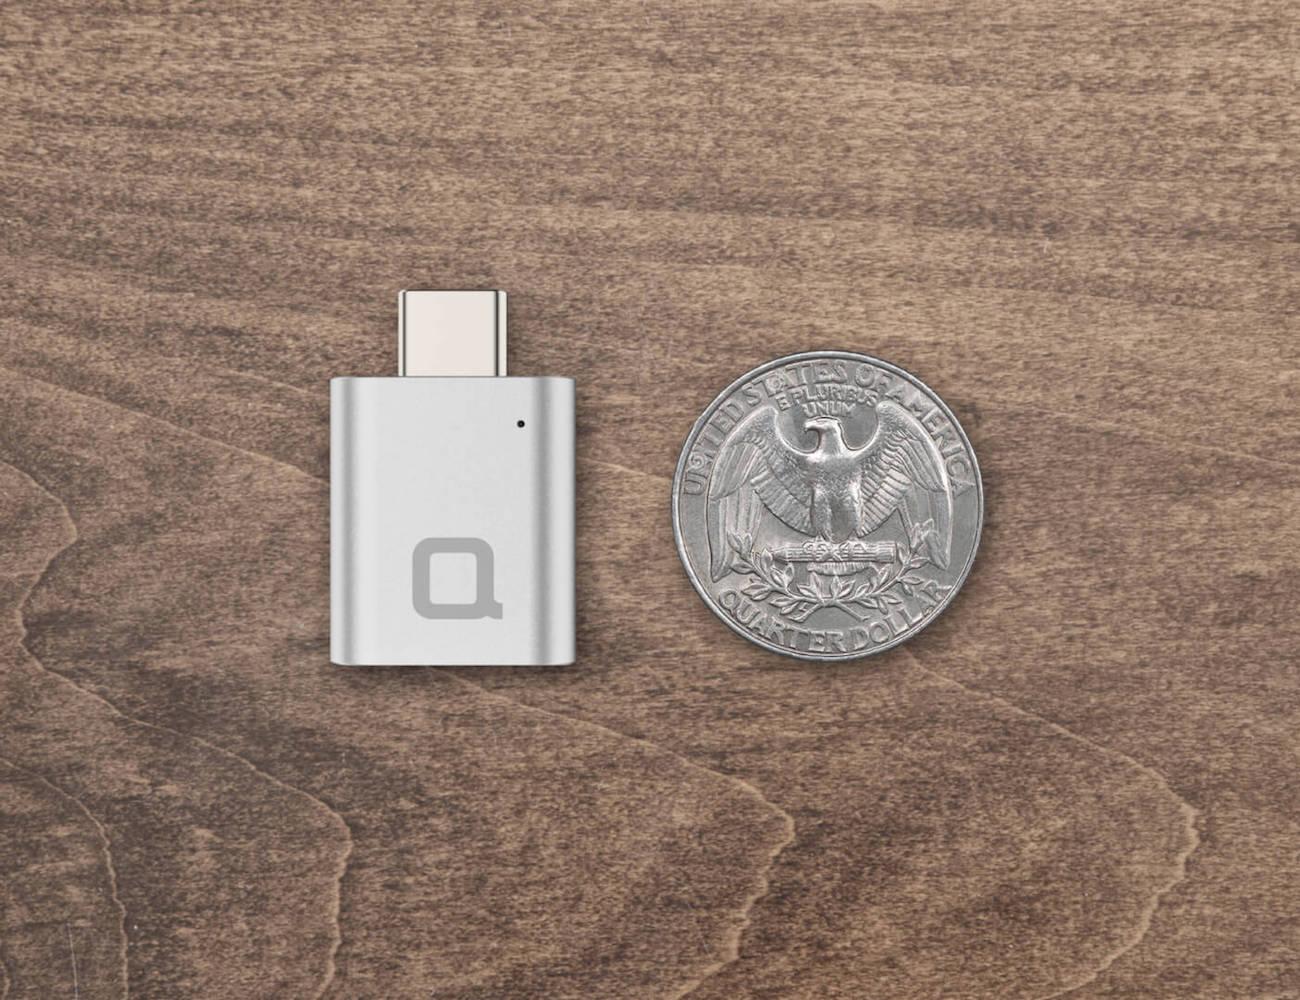 USB-C Mini – The World's Smallest USB-C Adapter by Nonda